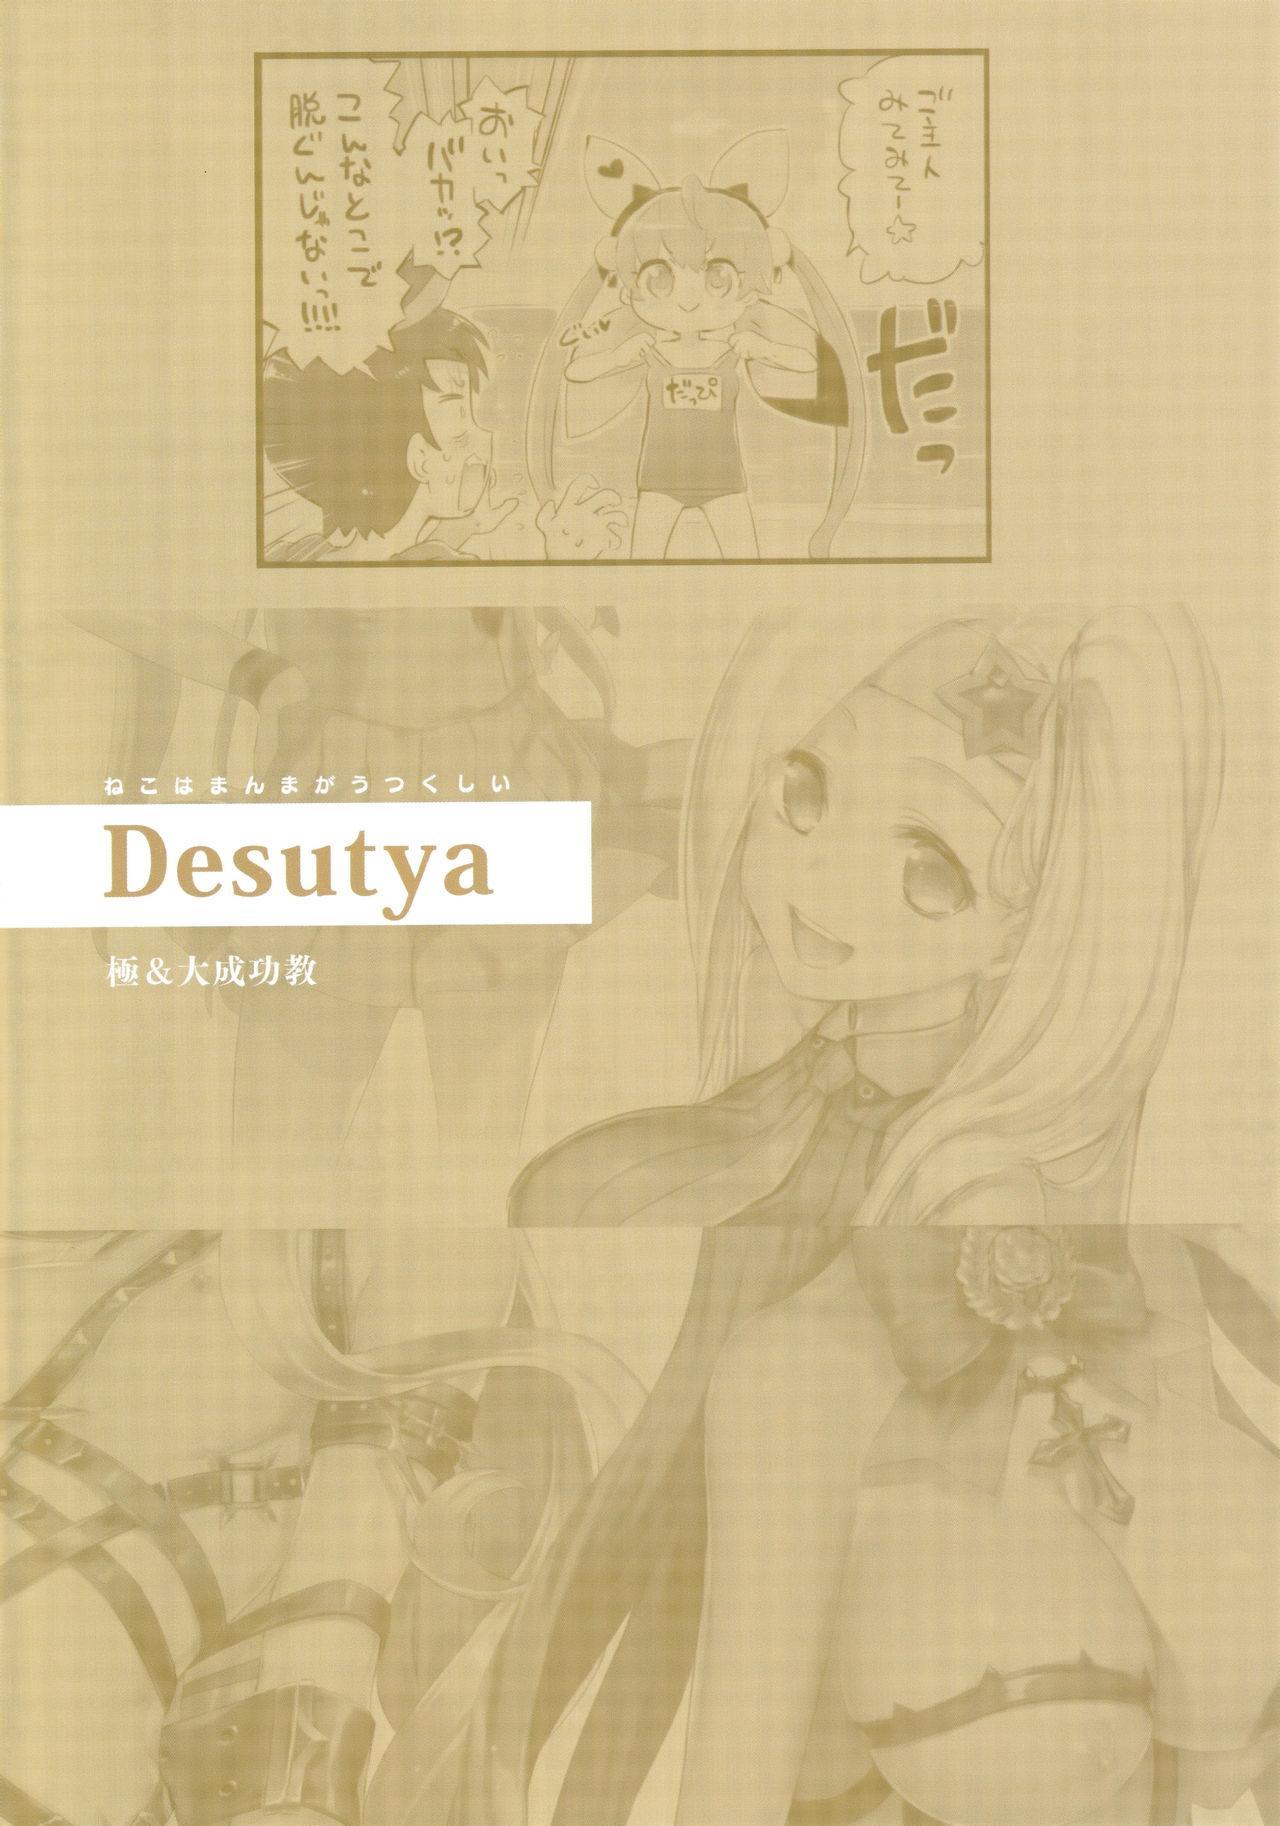 Kyoku&Daiseikou Kyou 6